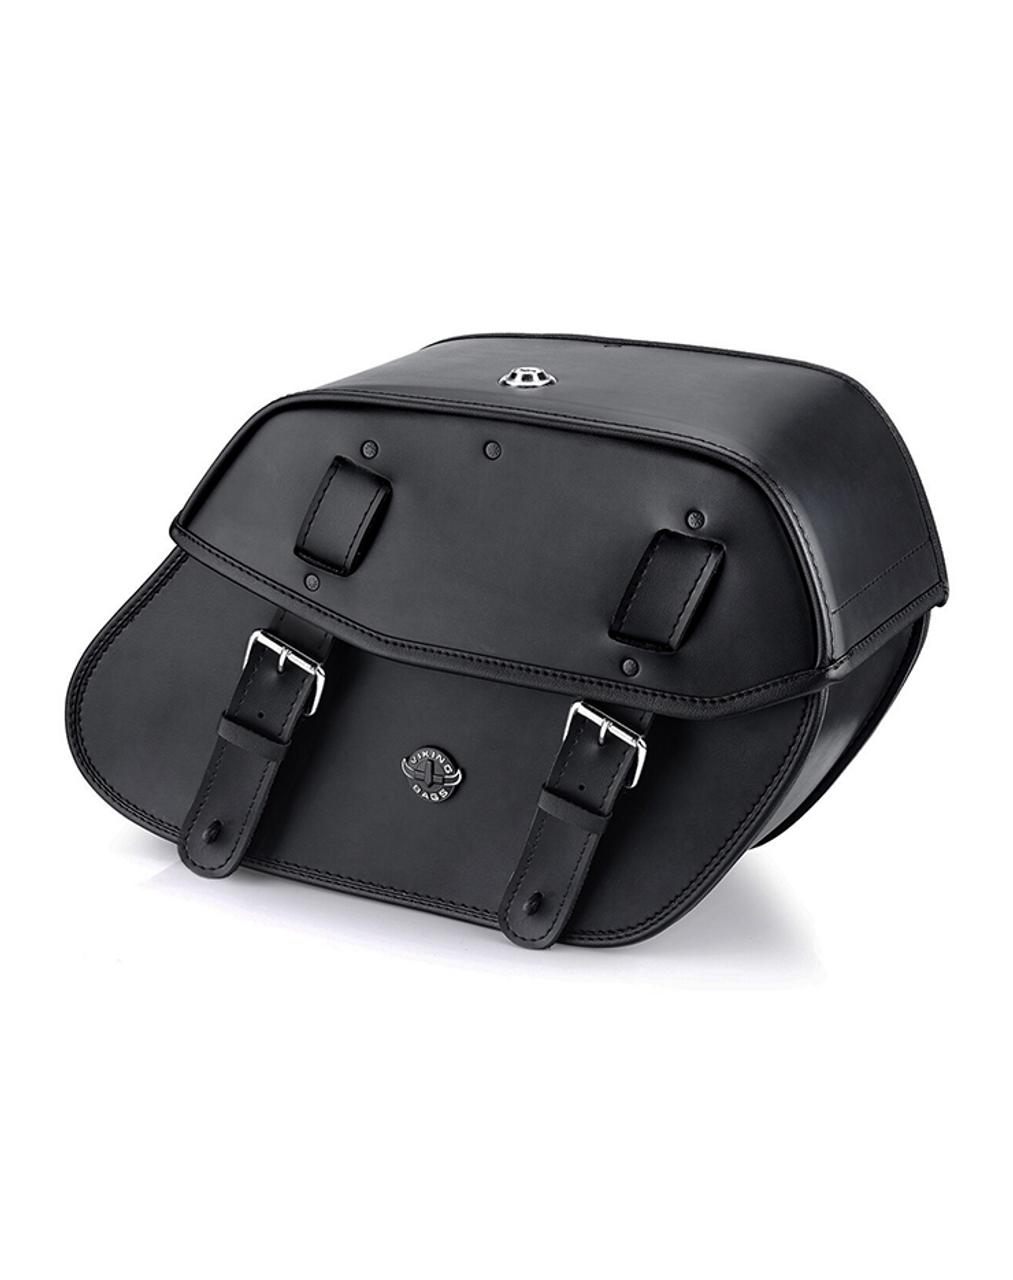 Viking Odin Medium Motorcycle Saddlebags For Harley Softail Custom FXSTC Main View